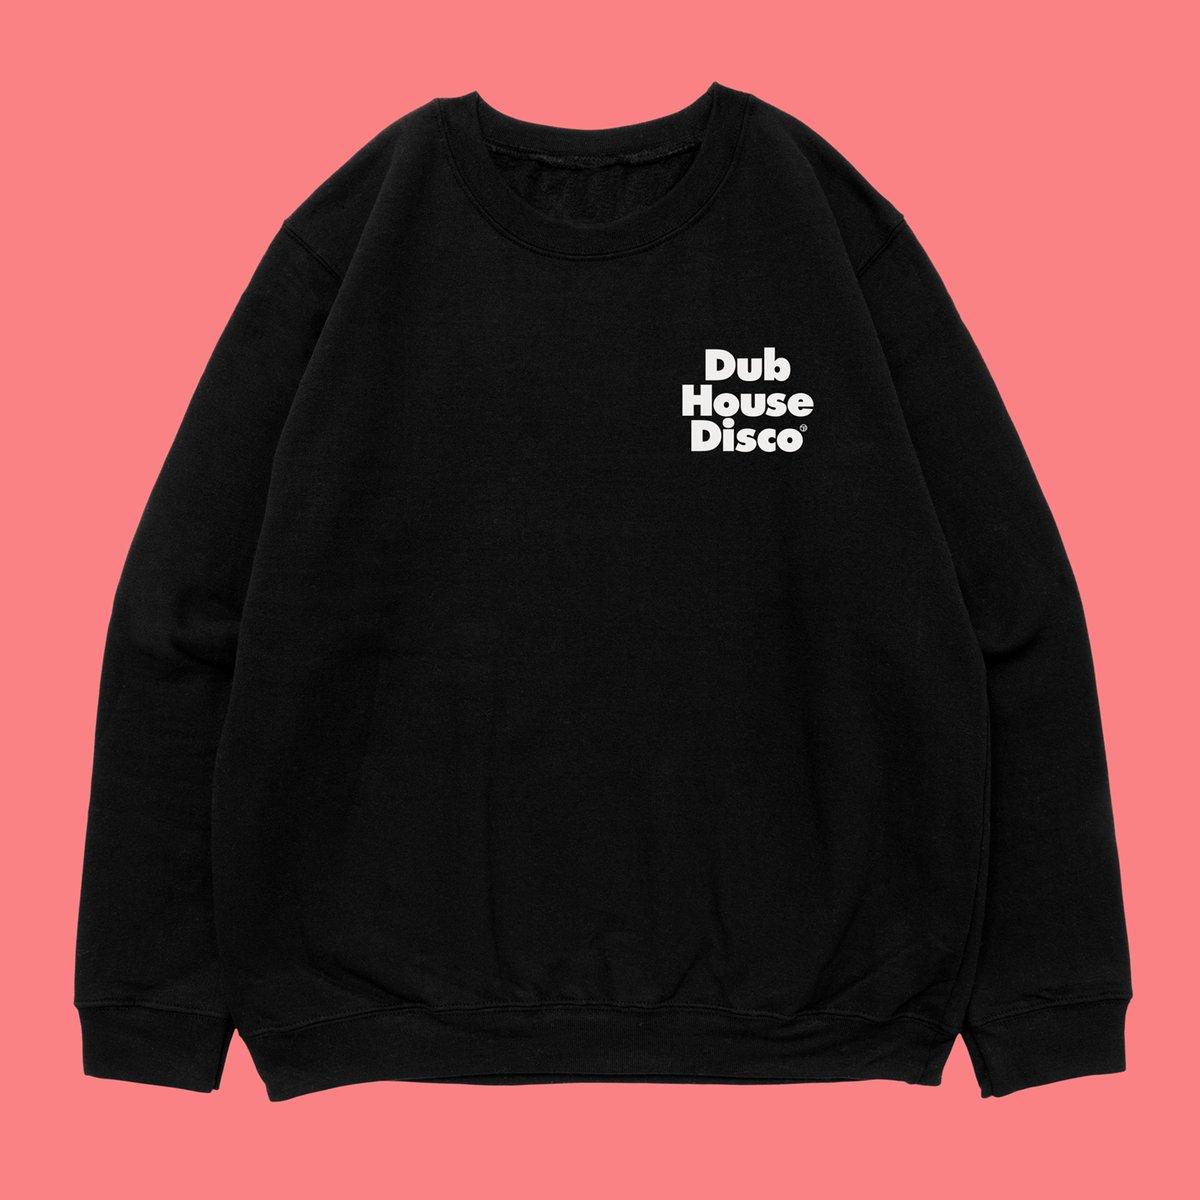 Image of Dub House Disco –White On Black Sweatshirt